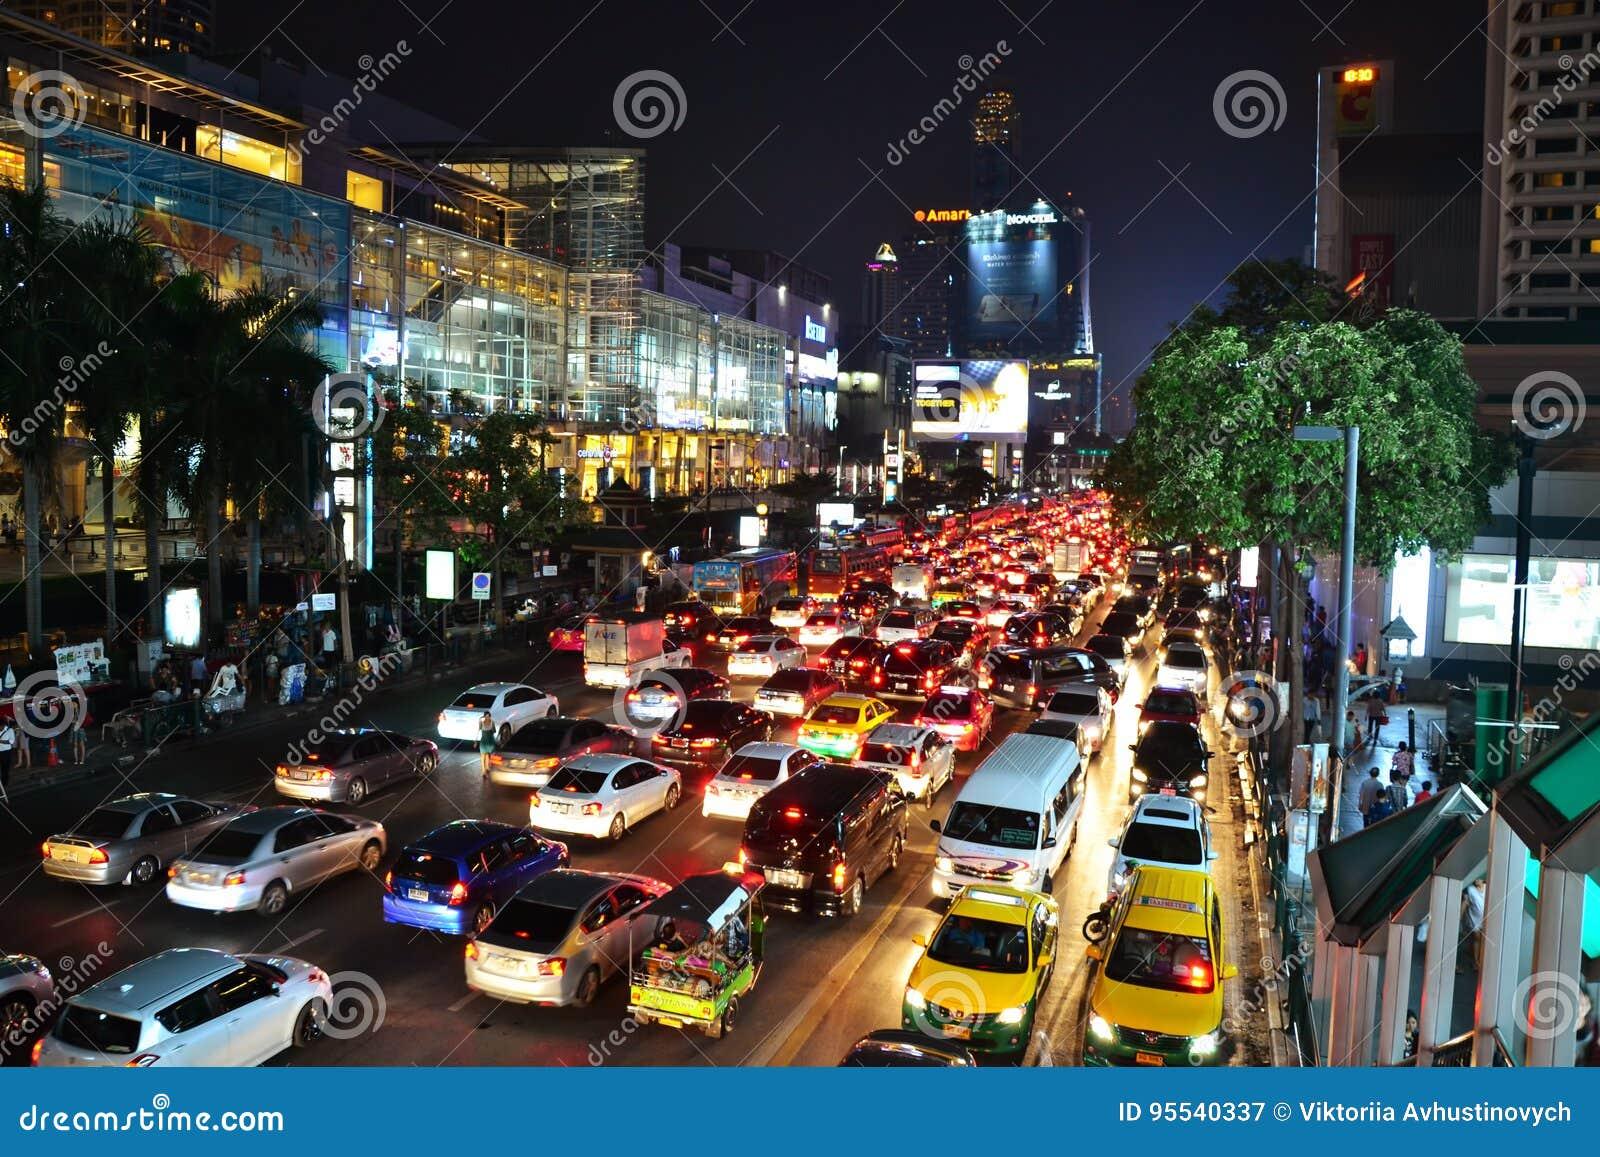 Traffic jam in Bangkok editorial photography  Image of asian